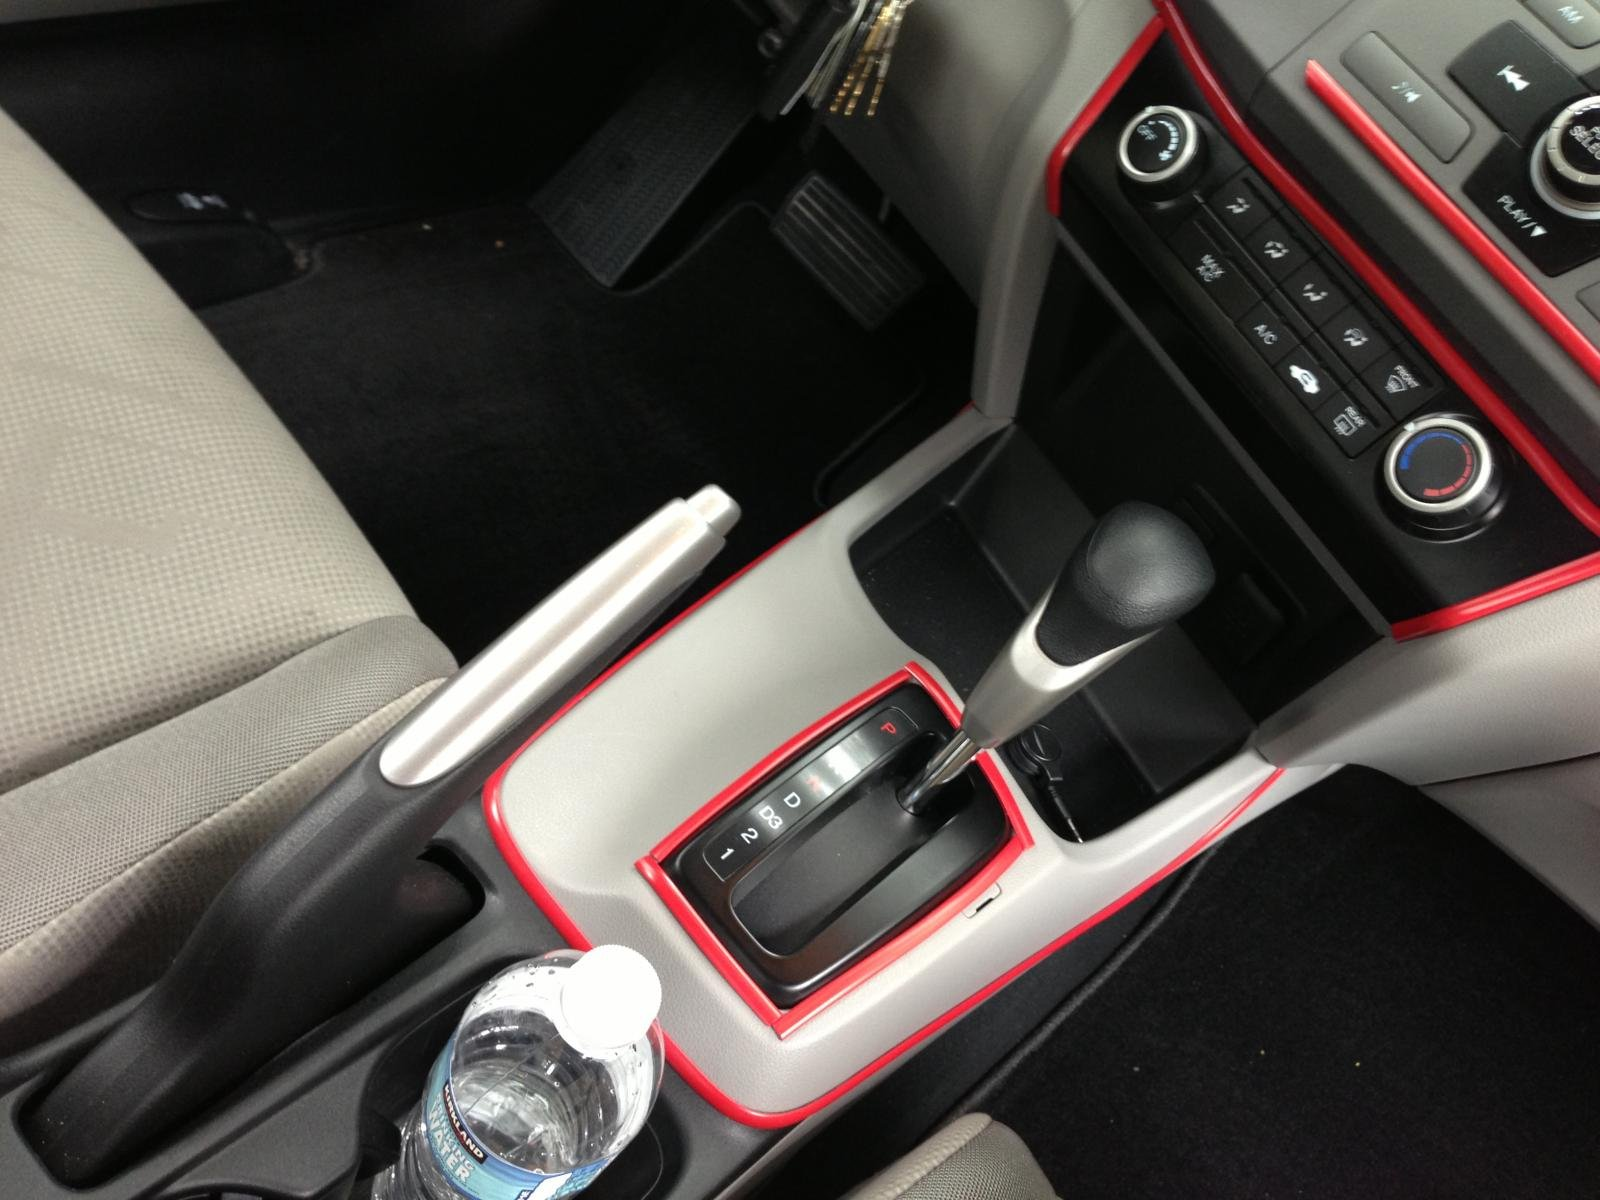 Car interior piping -  Interior Door Piping Welt Trimming Image Jpg